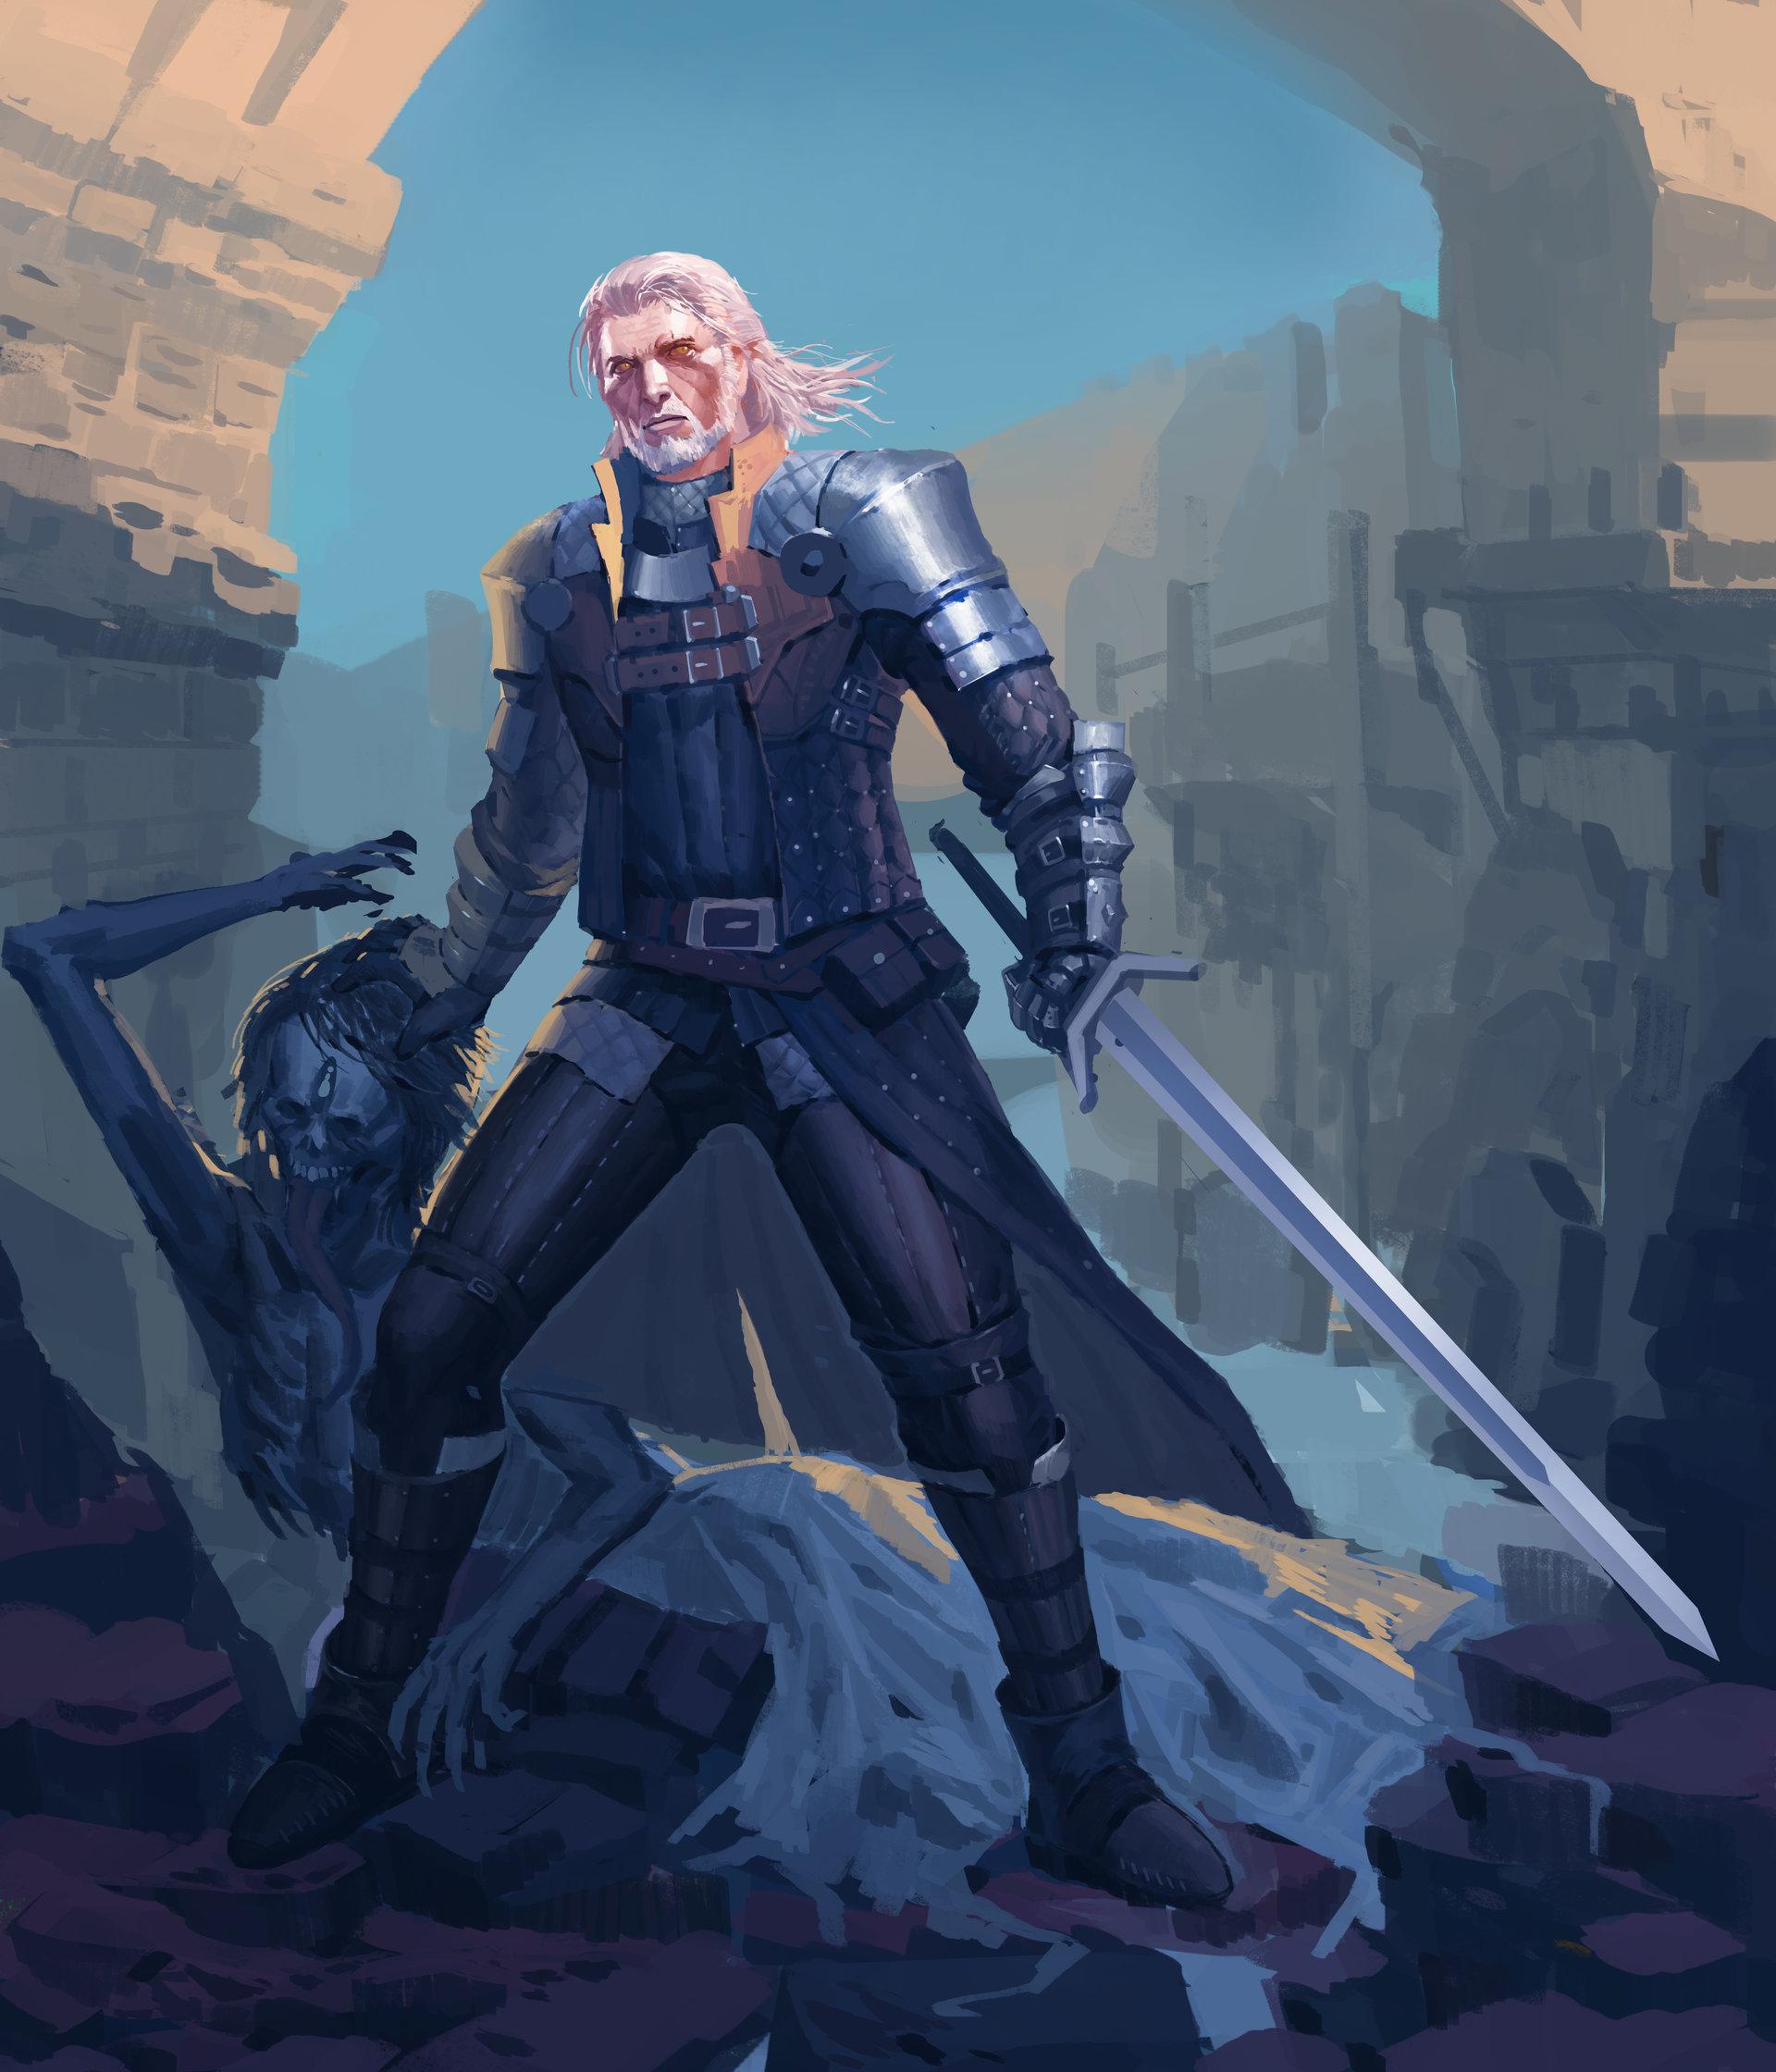 The Witcher 3 concept art picture witcher-fan-art Геральт